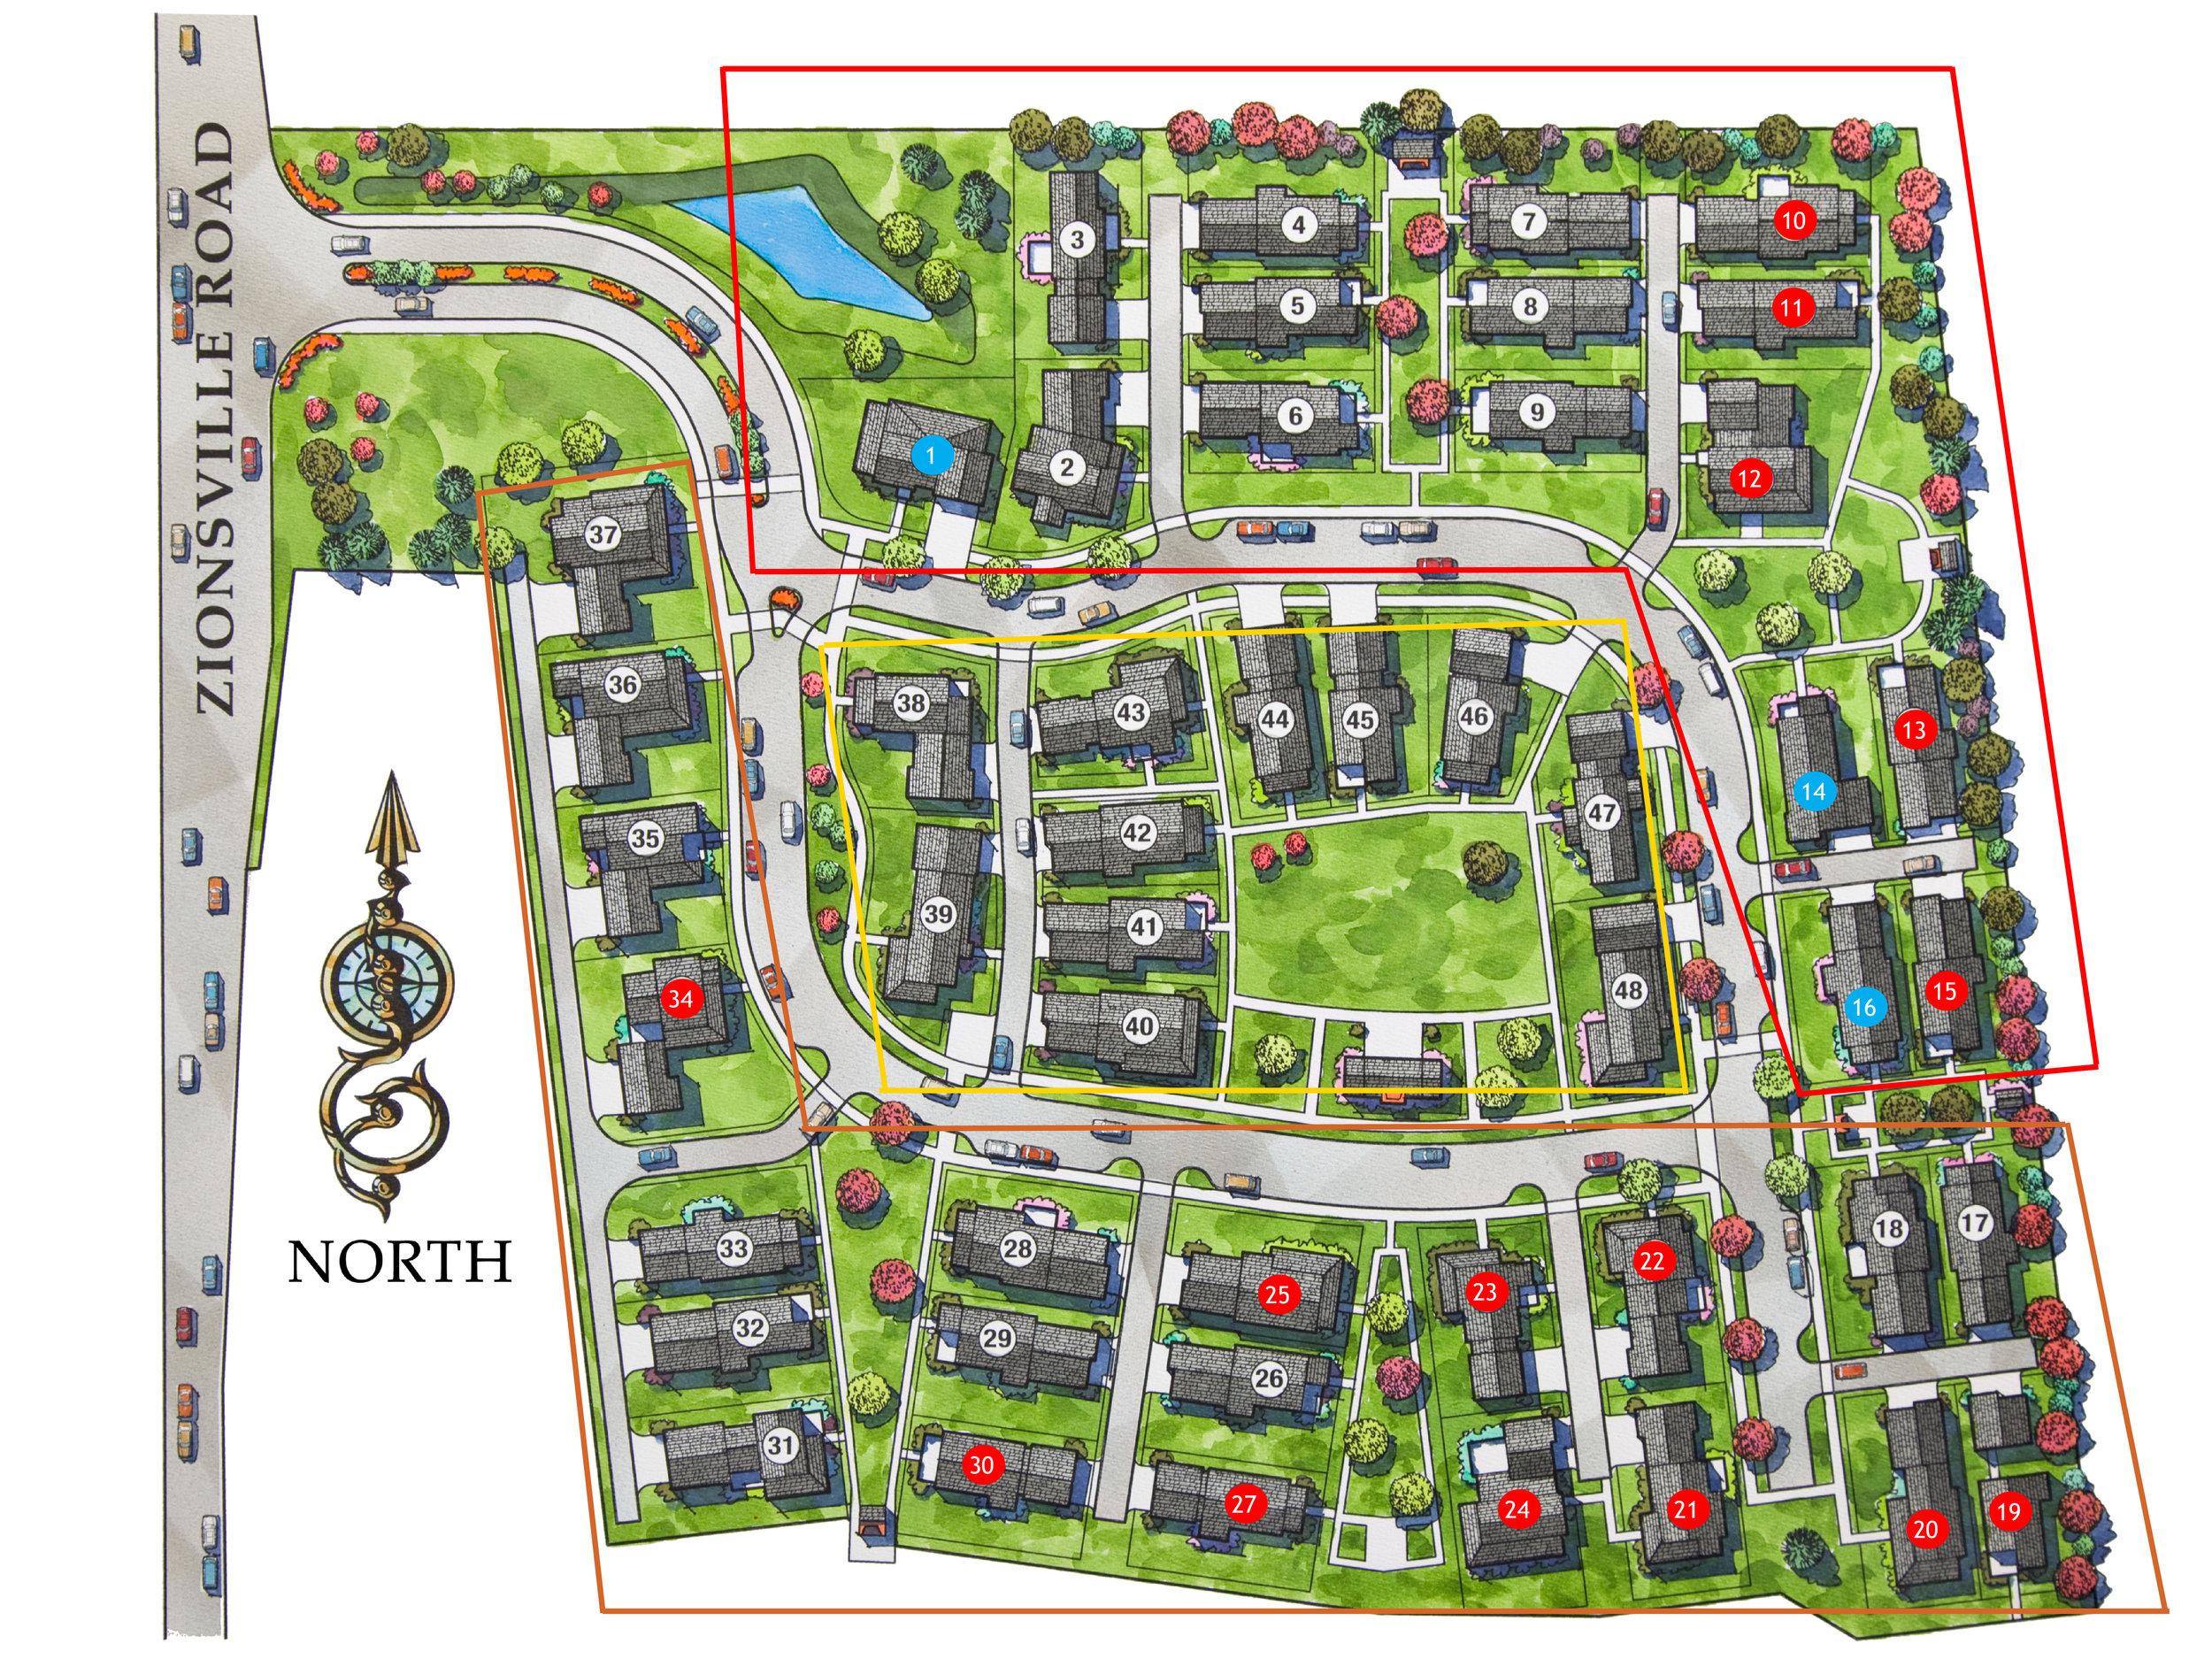 Inglenook of Zionsville Neighborhood Plan